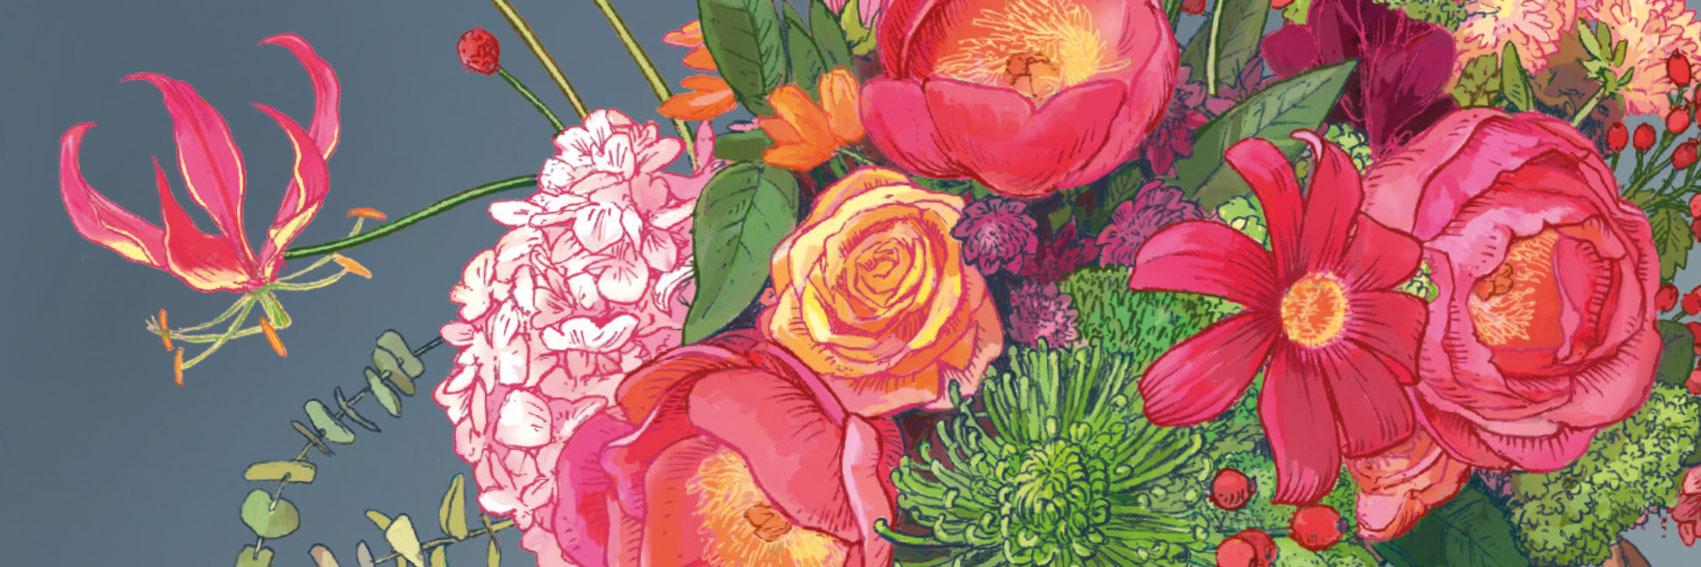 florist.ch